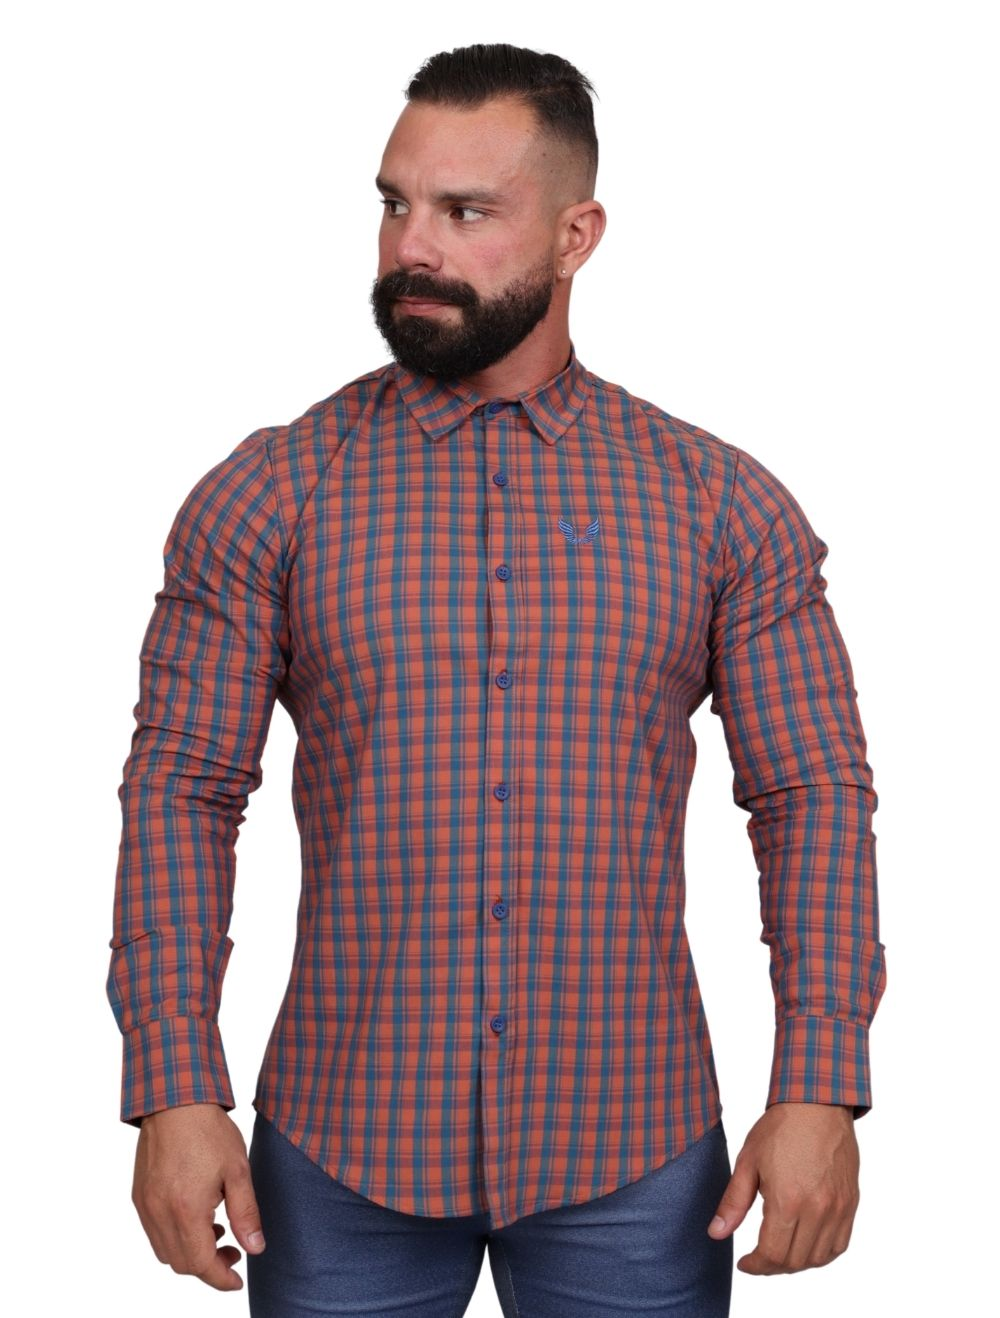 Camisa Masculina Slim Manga Longa com Elastano Xadrez